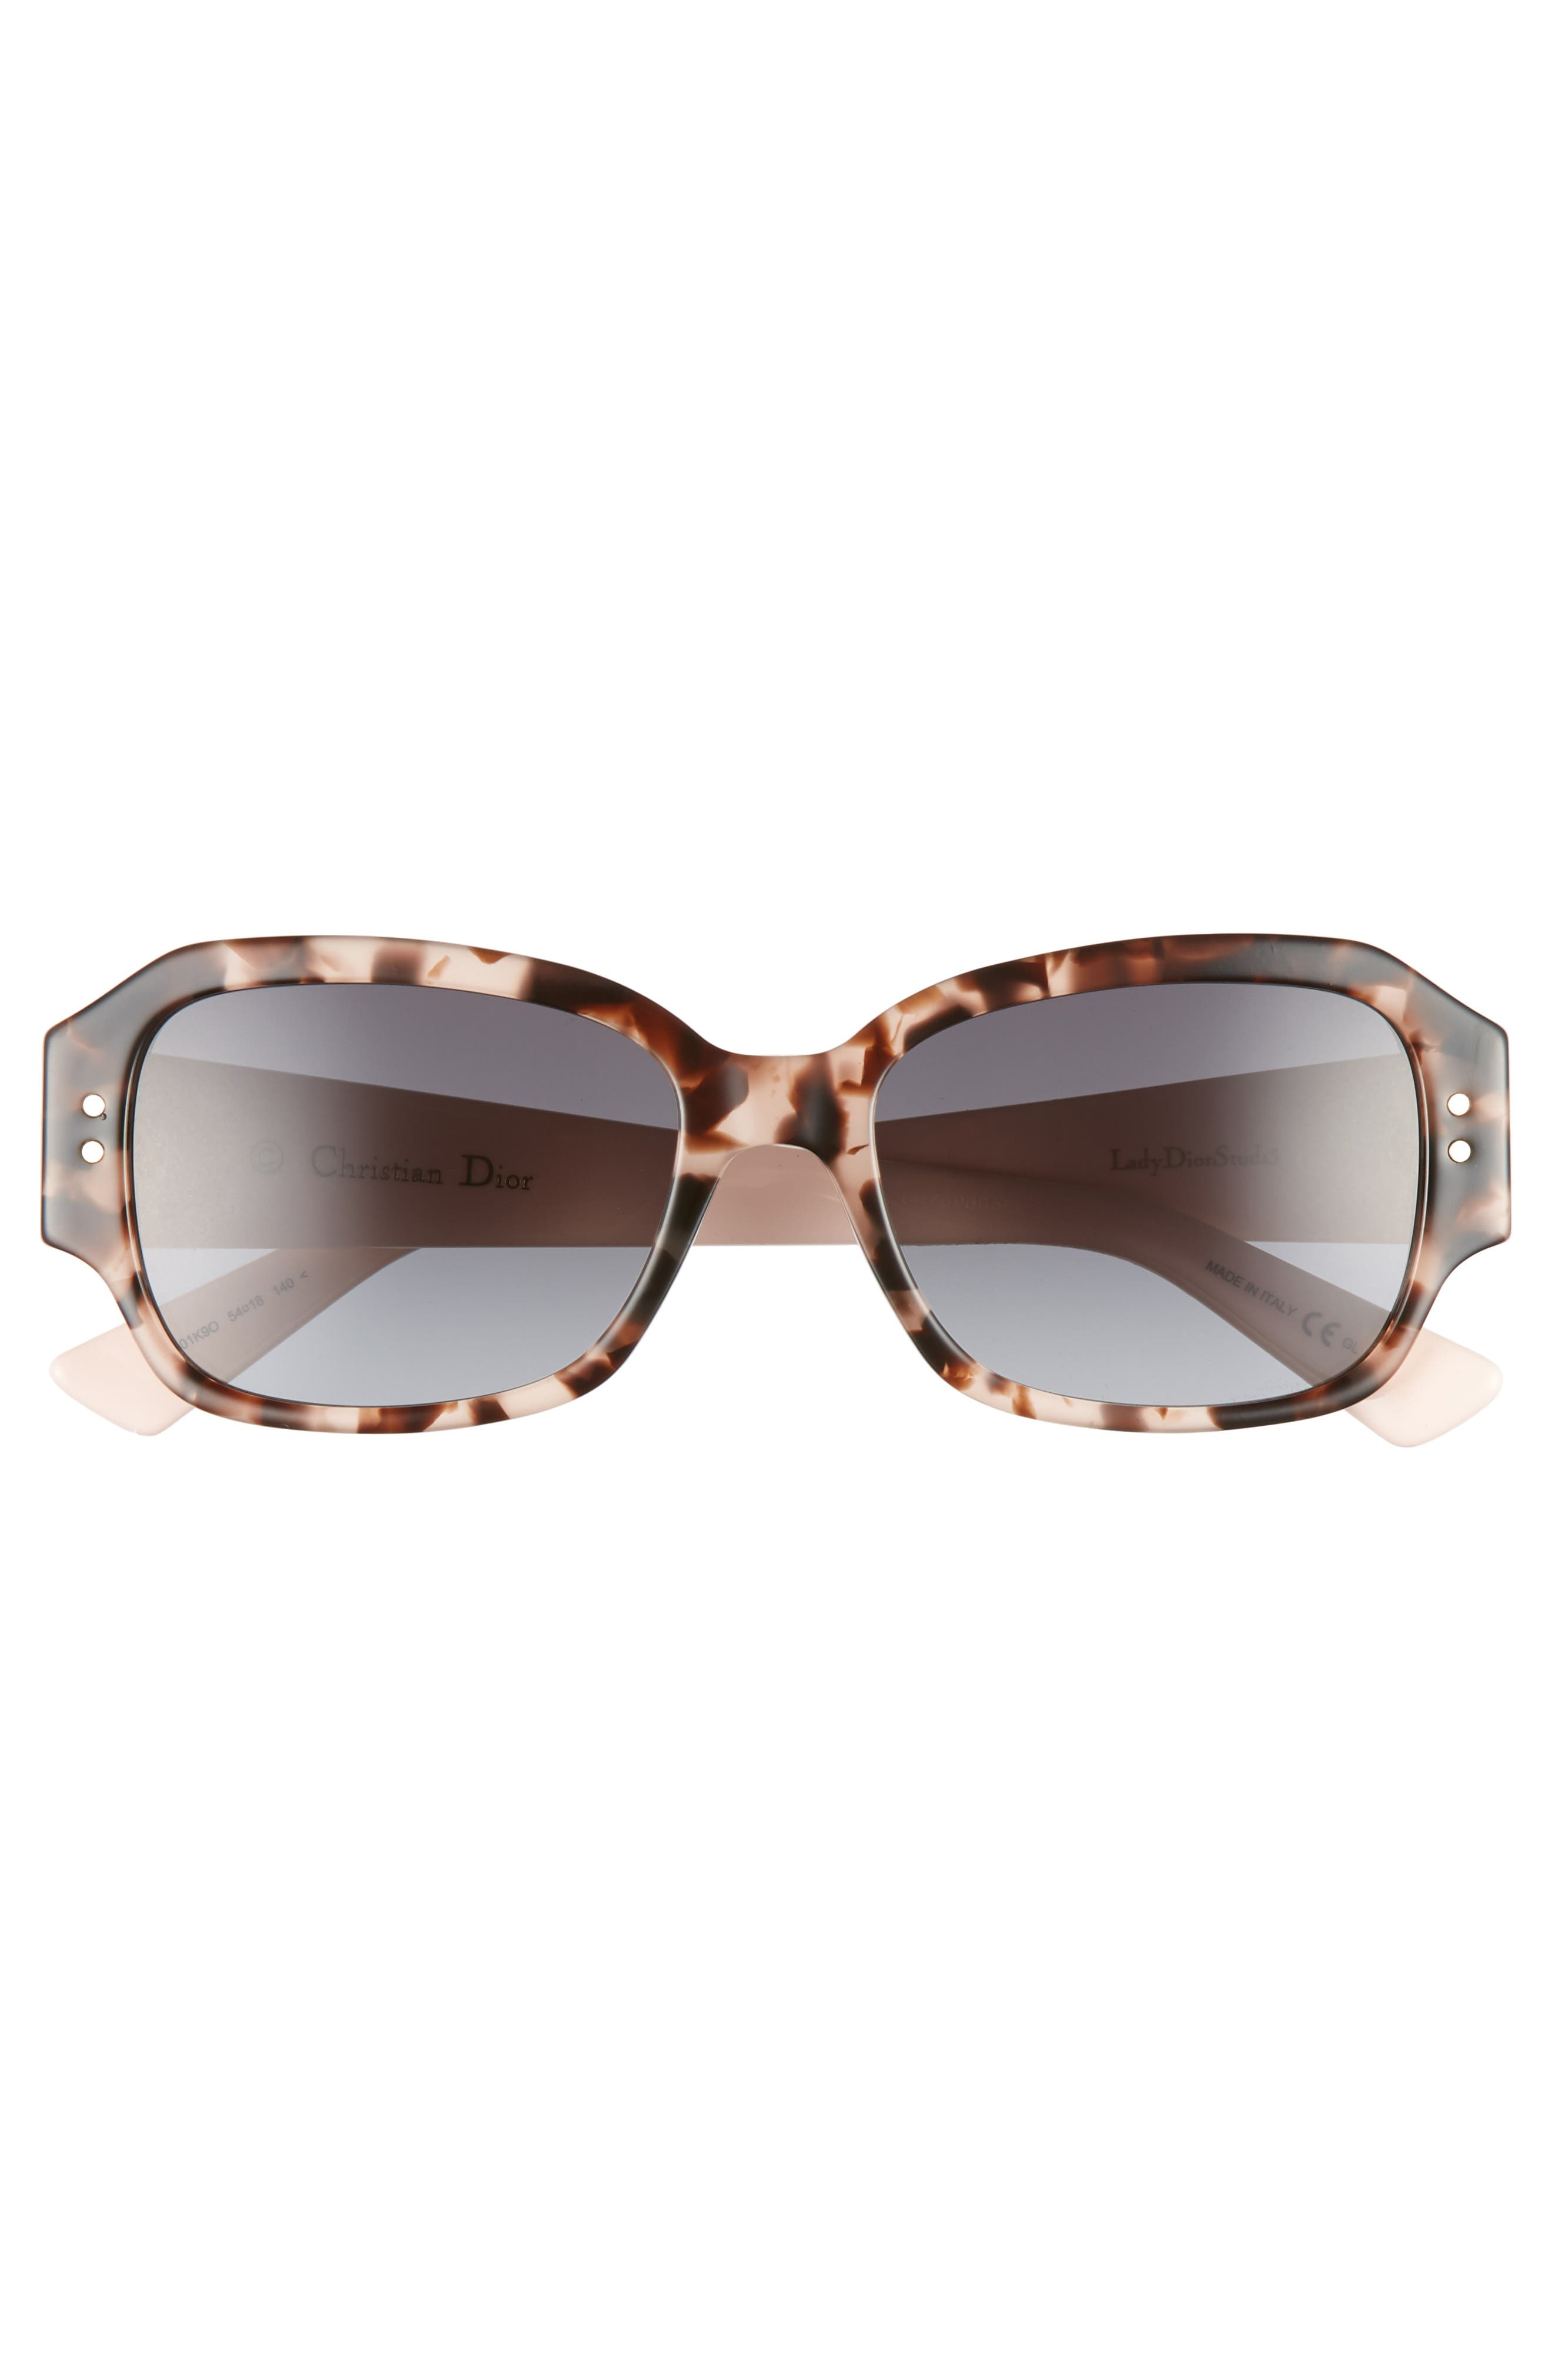 Ladydiorstuds5 54mm Sunglasses,                             Alternate thumbnail 3, color,                             HAVANA LIGHT PINK